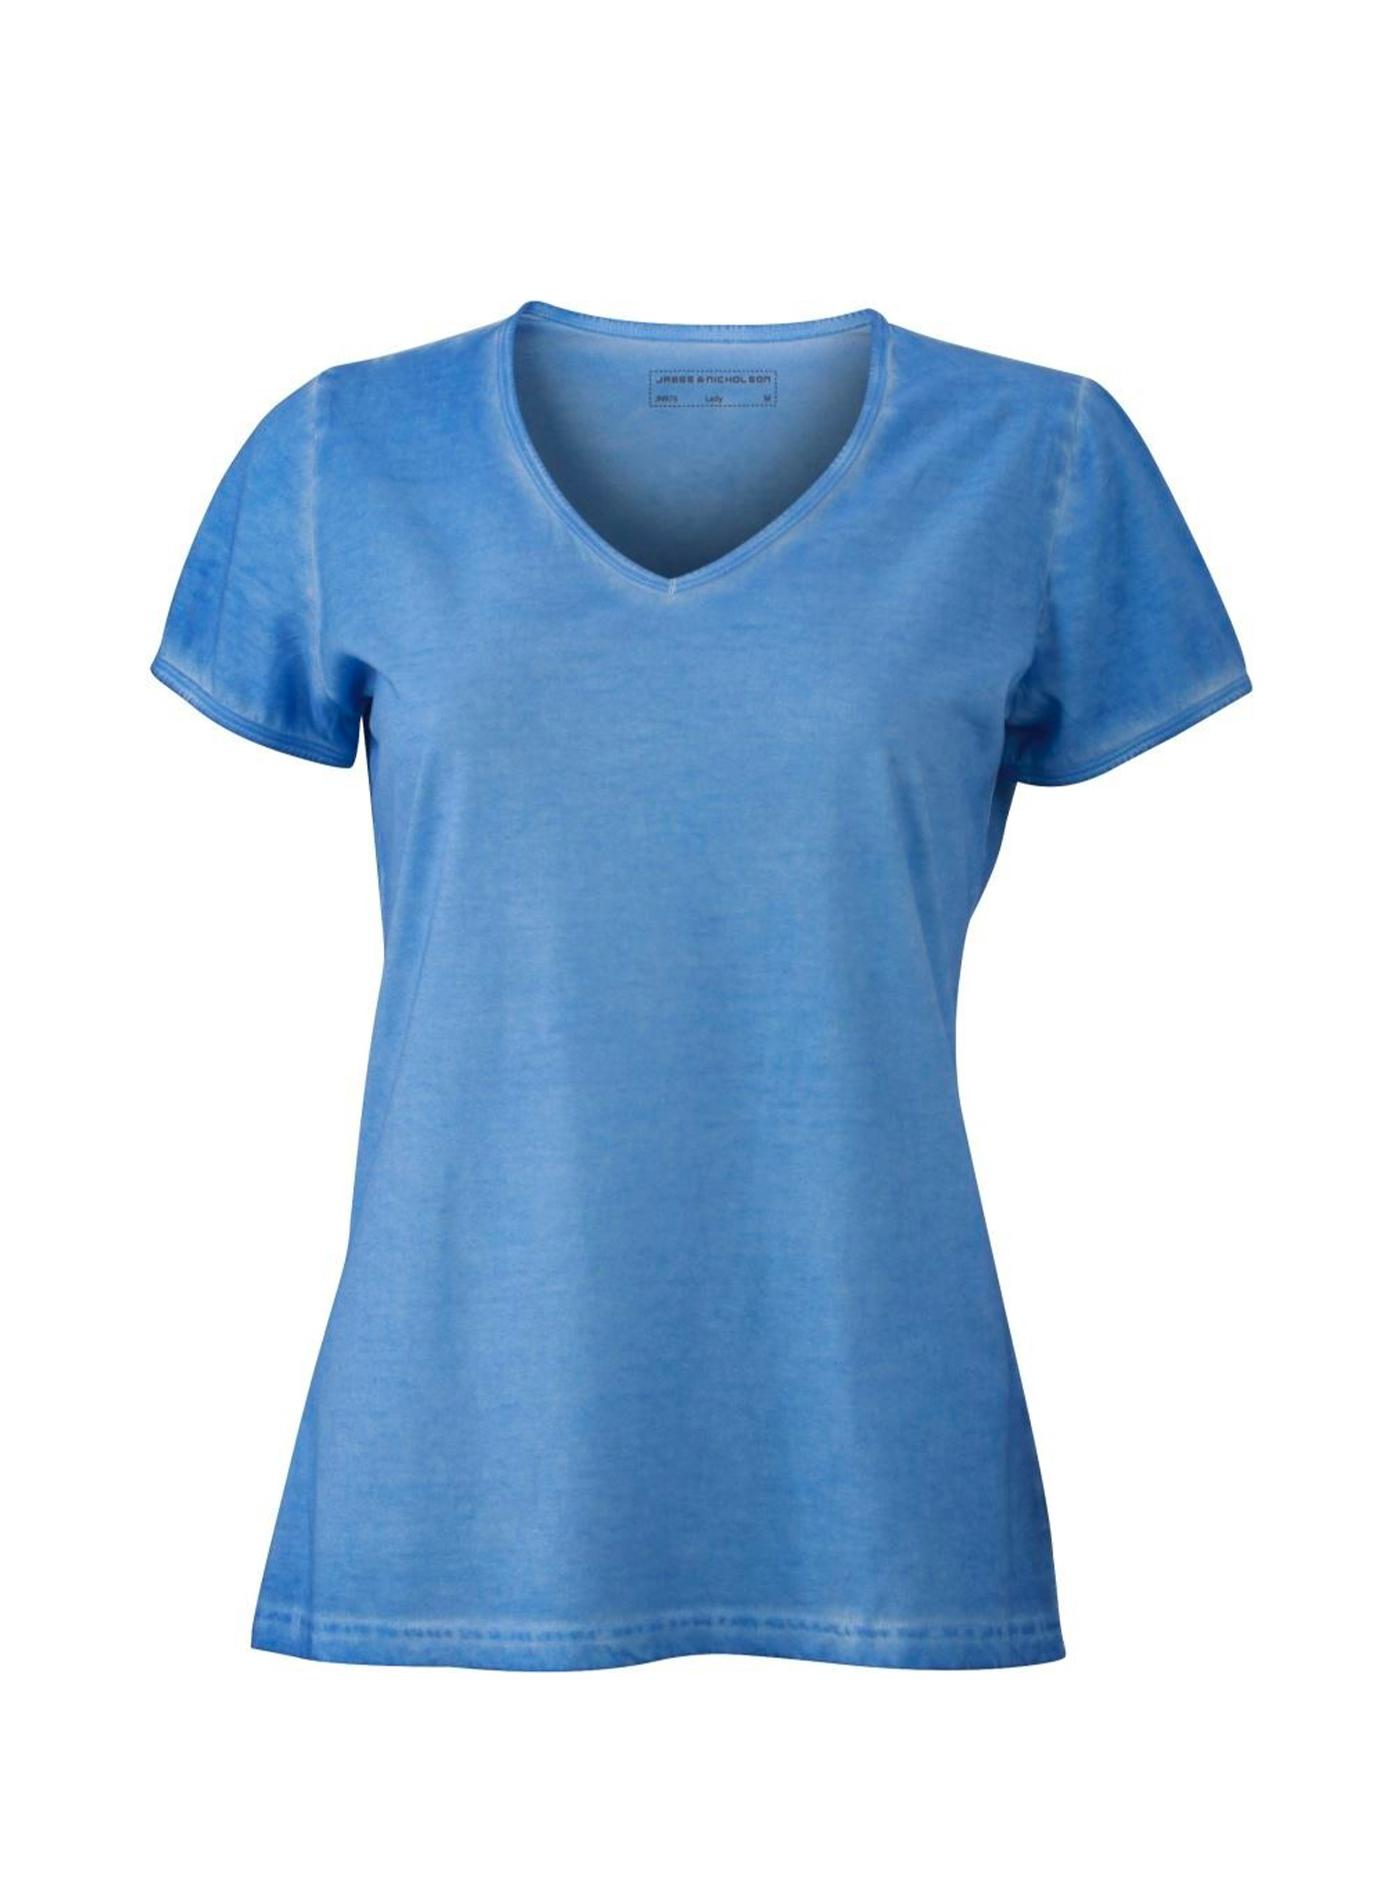 Tričko Gipsy - Modrá S